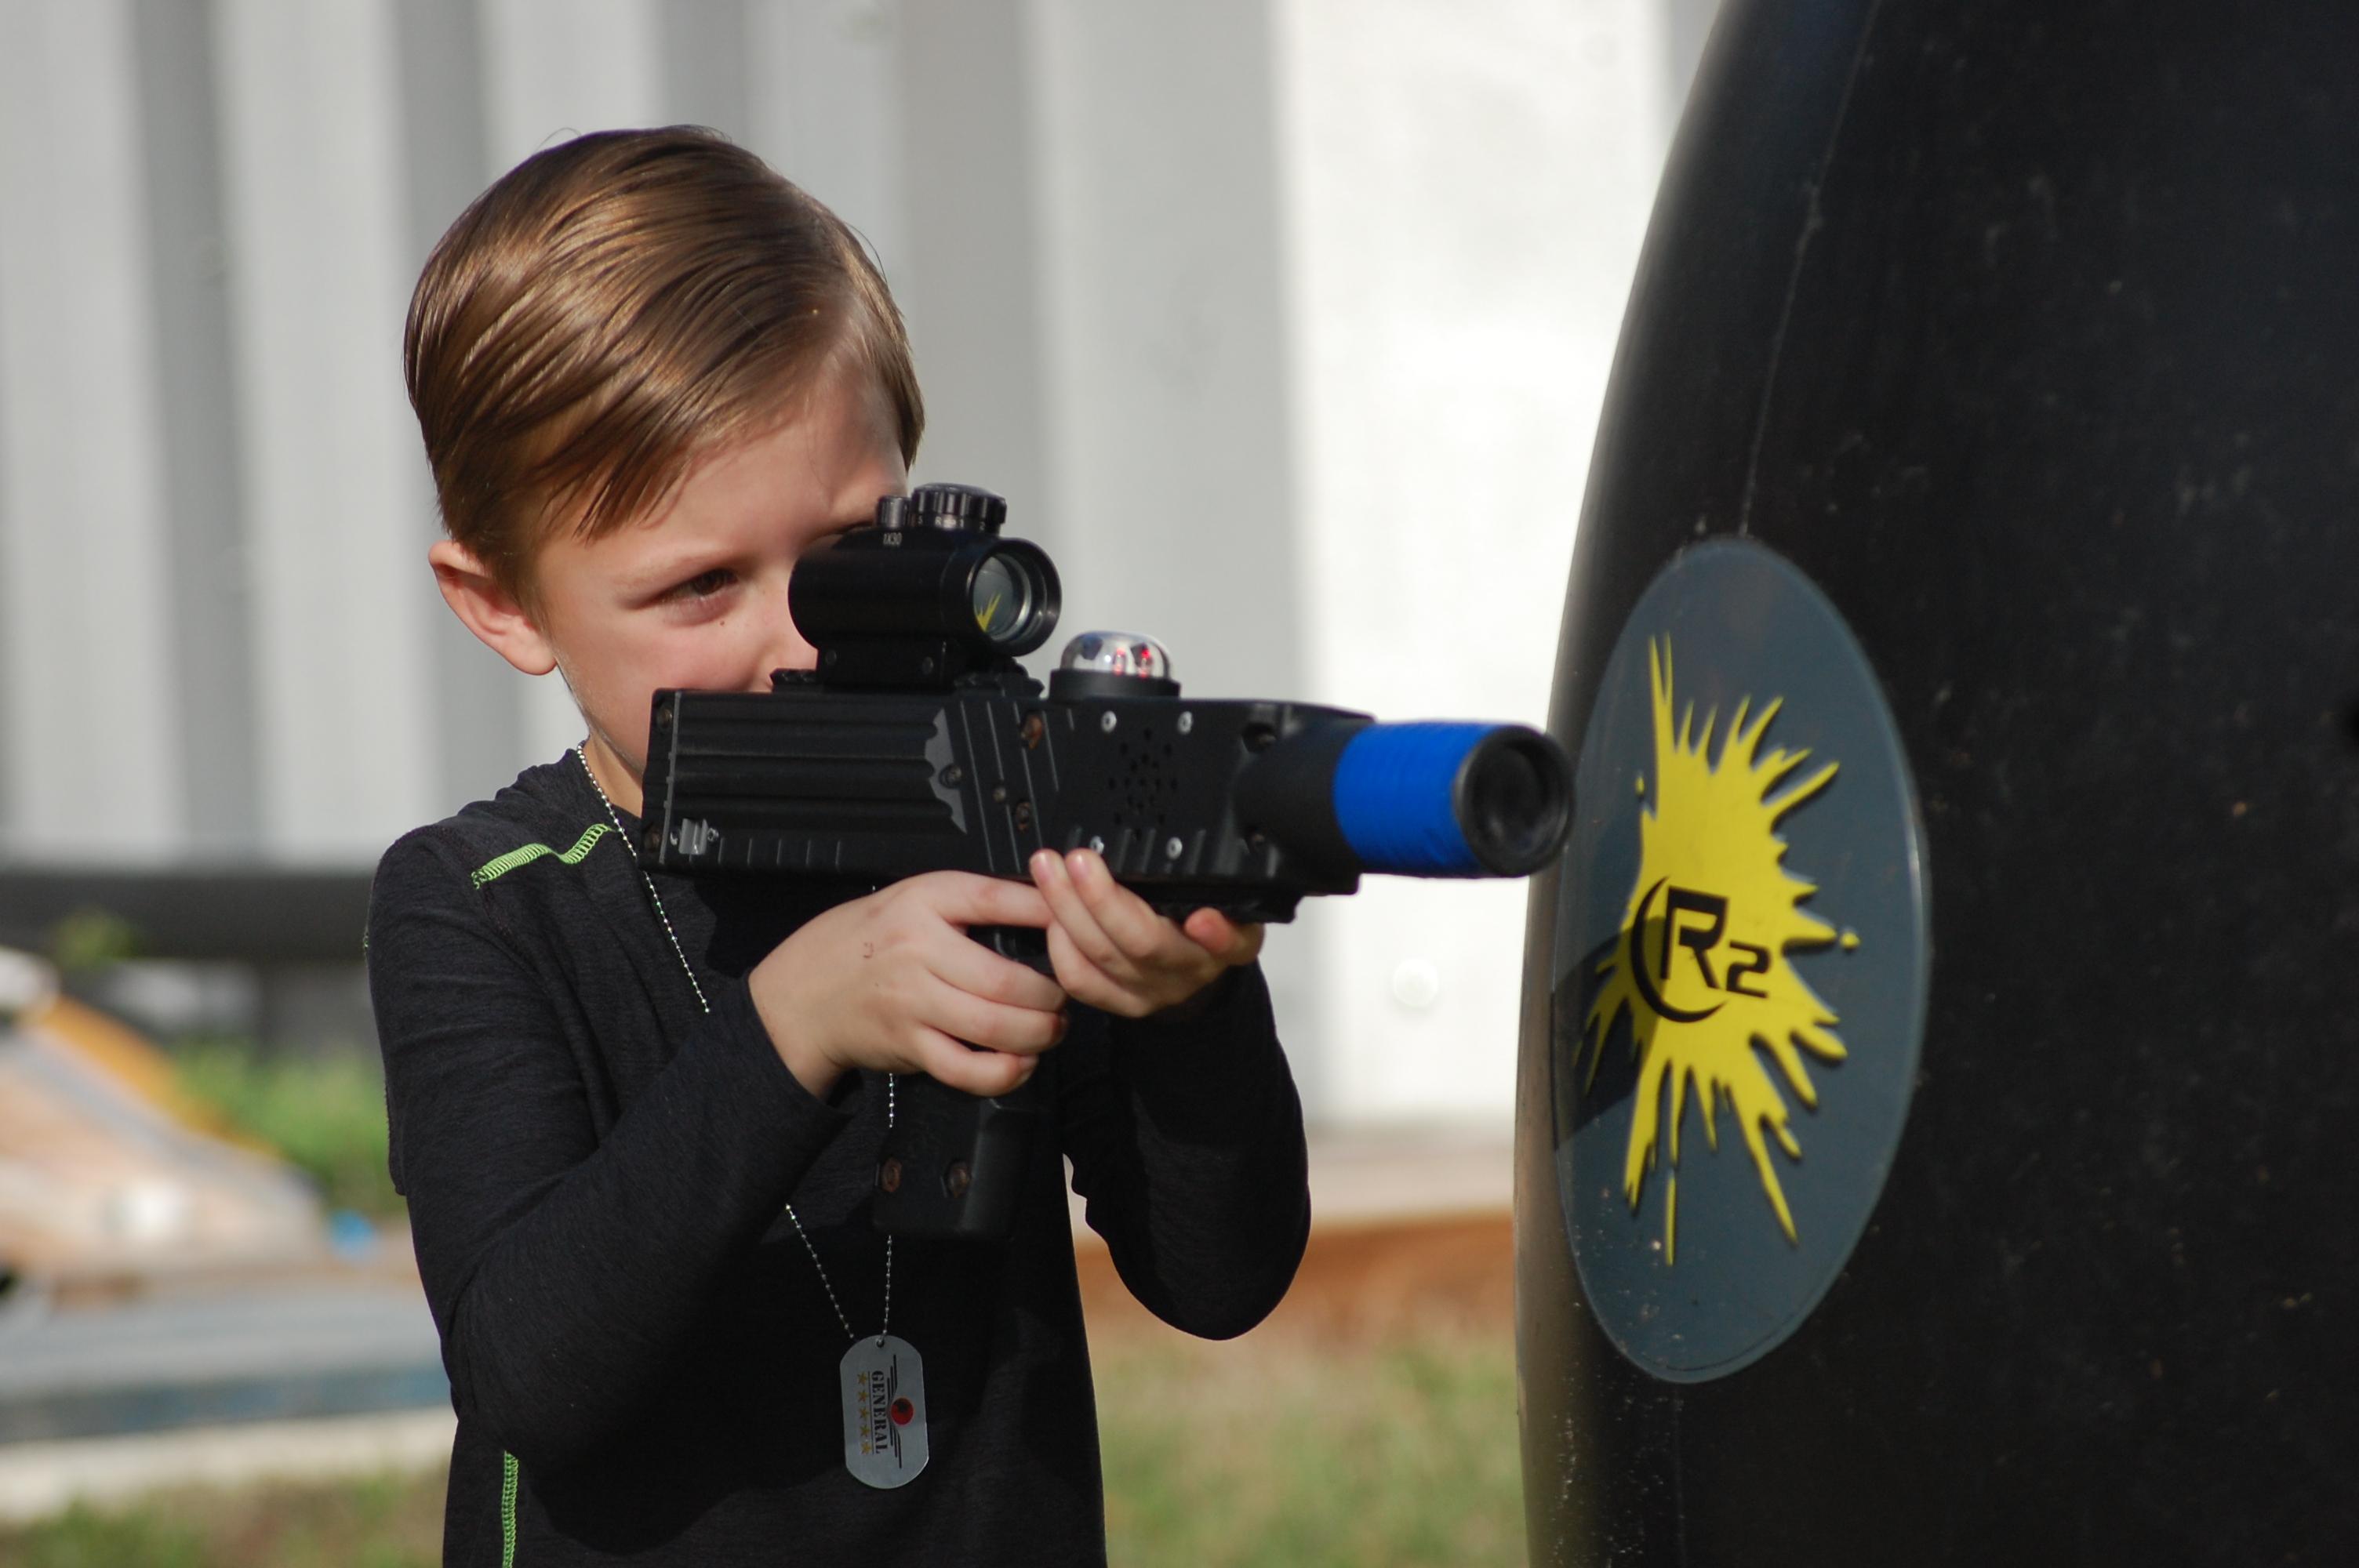 Laser tag in Fish Hawk, FL